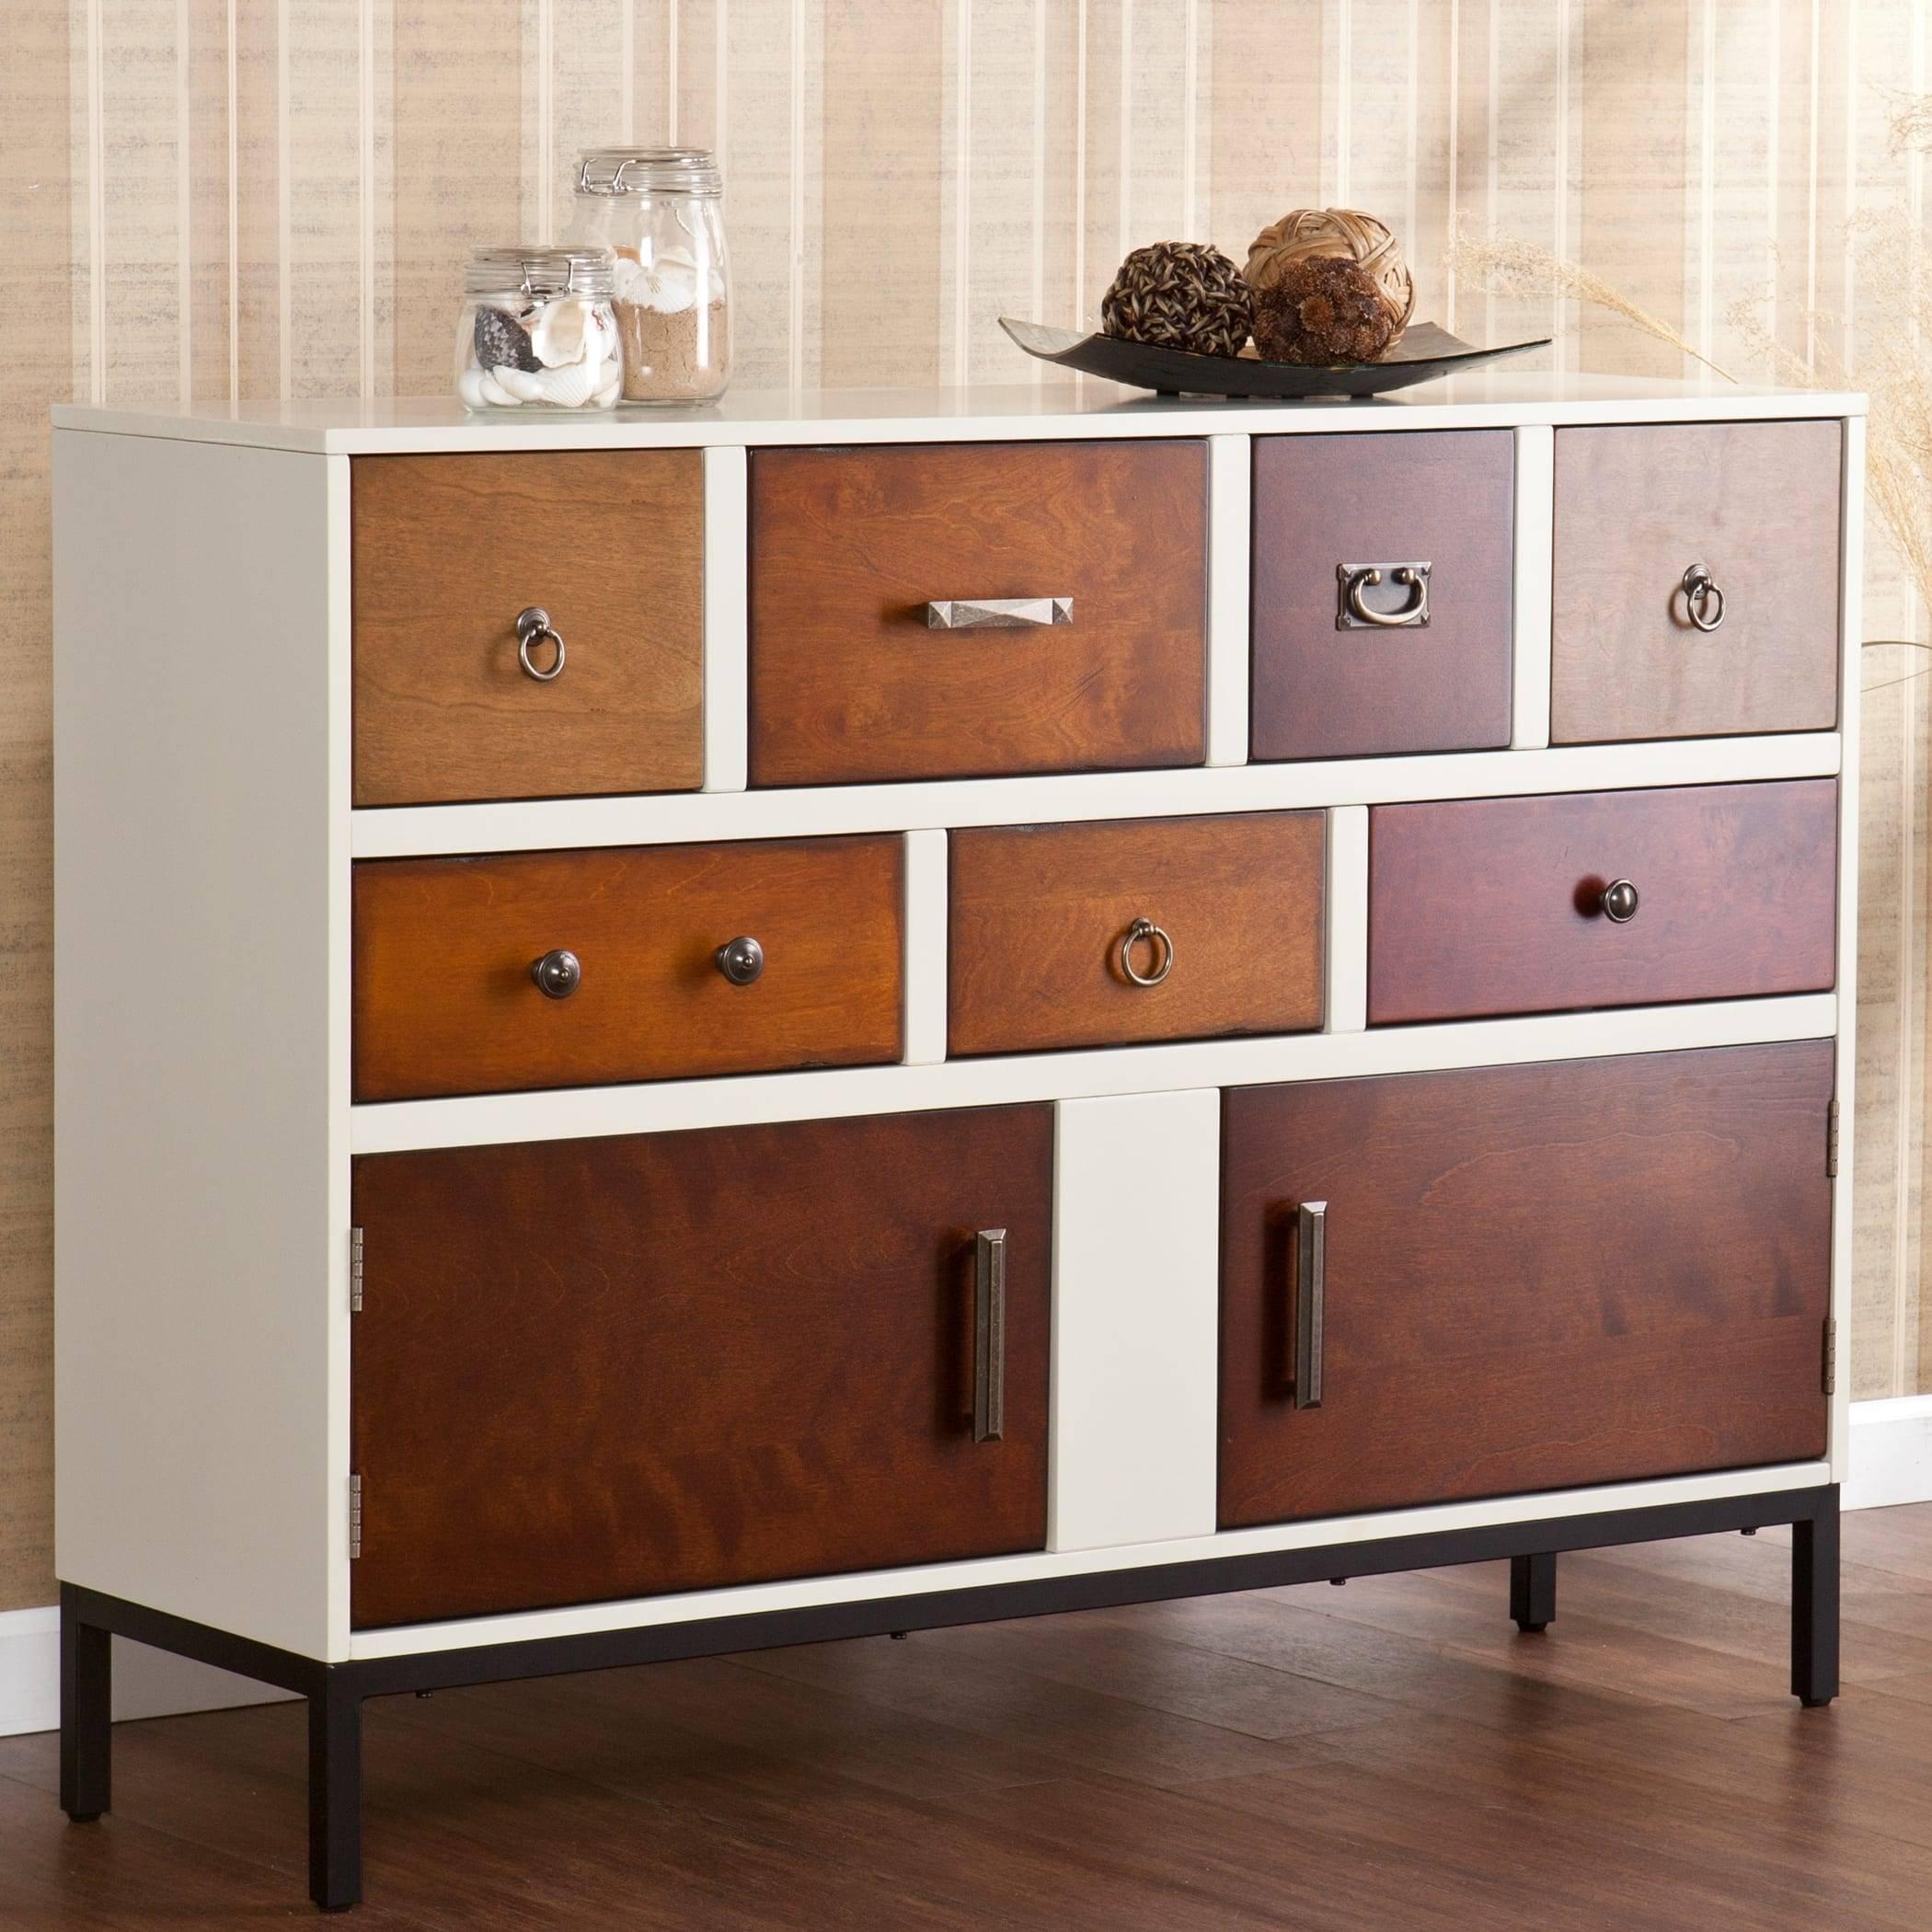 Christian Multi Finish Dining Room Buffet – Free Shipping Today Regarding Multi Drawer Sideboard (#11 of 20)